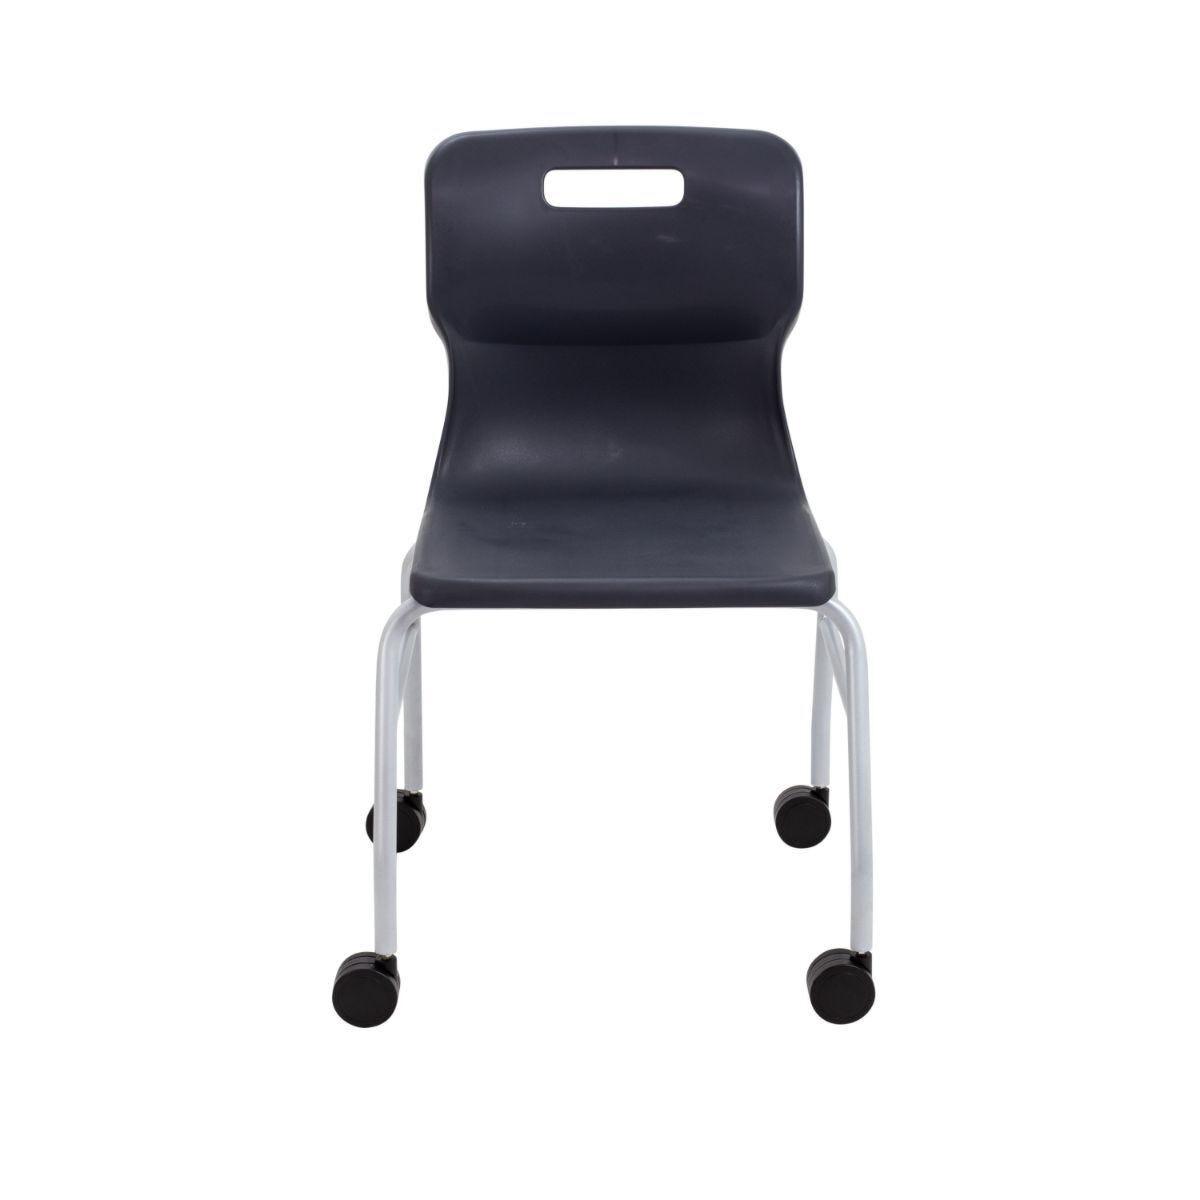 TC Office Titan Move 4 Leg Chair with Castors Charcoal